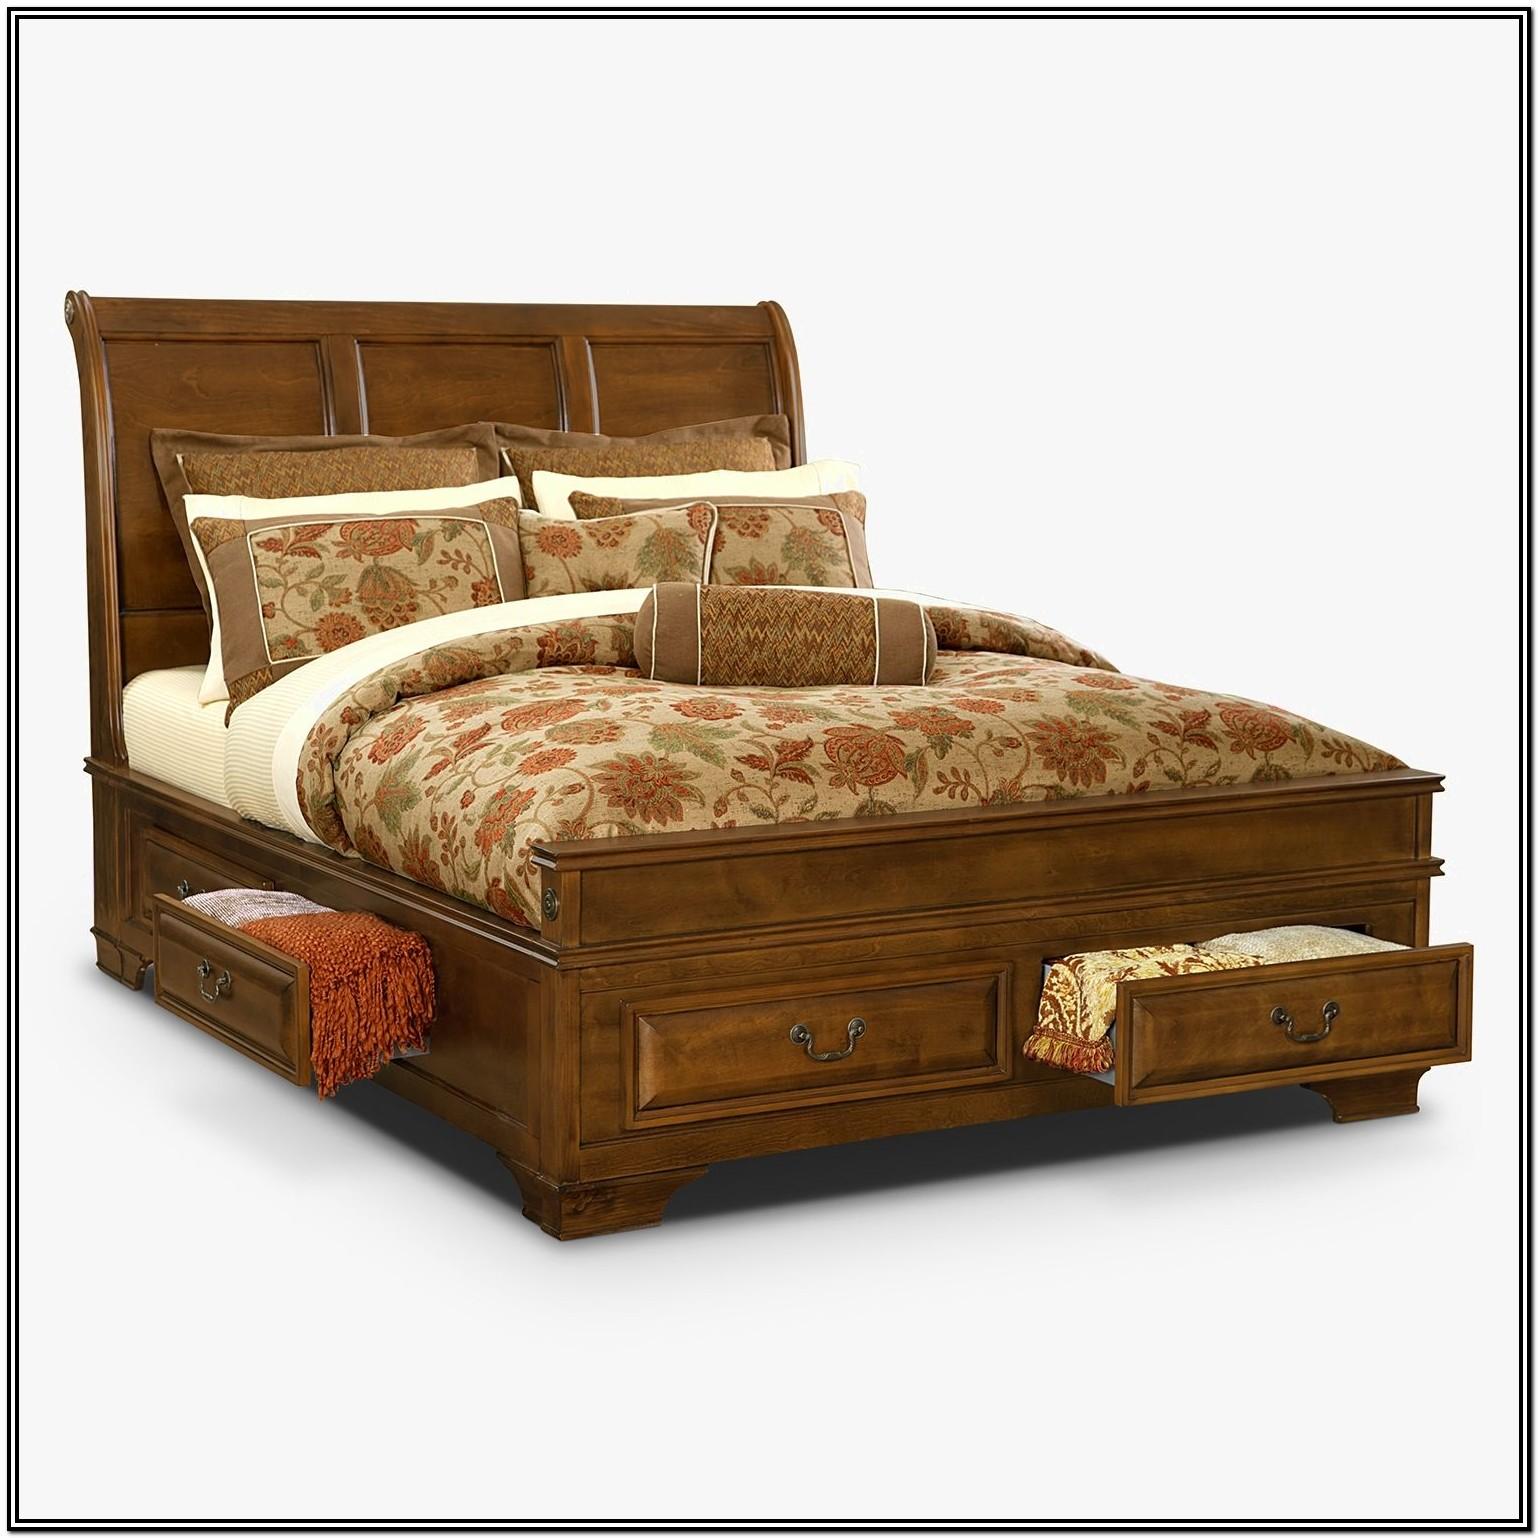 Low Profile Platform Bed Frame Queen